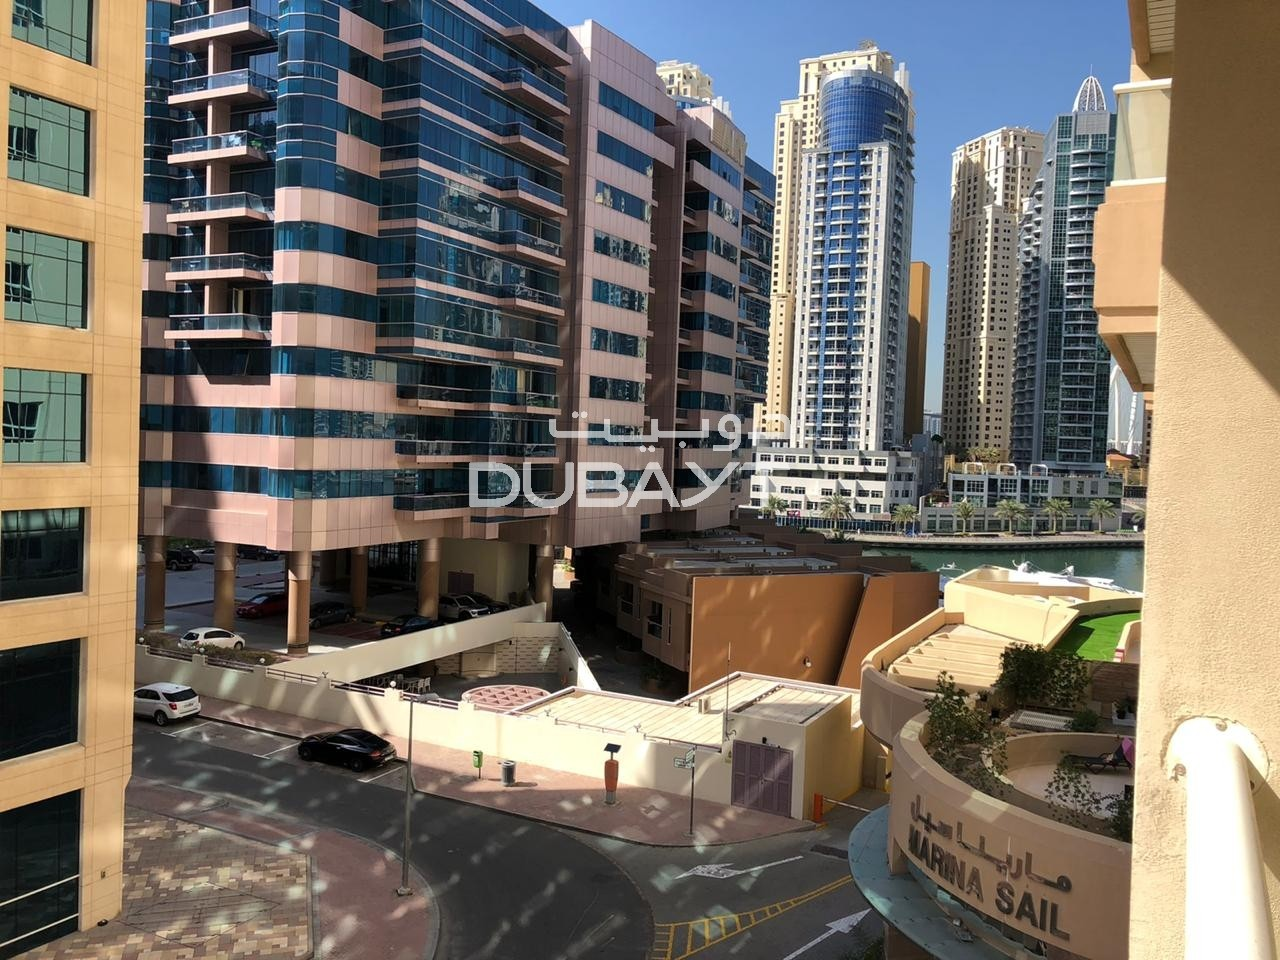 Pay 6 cheq 1BR+balcony, Unfurnished, Marina sail